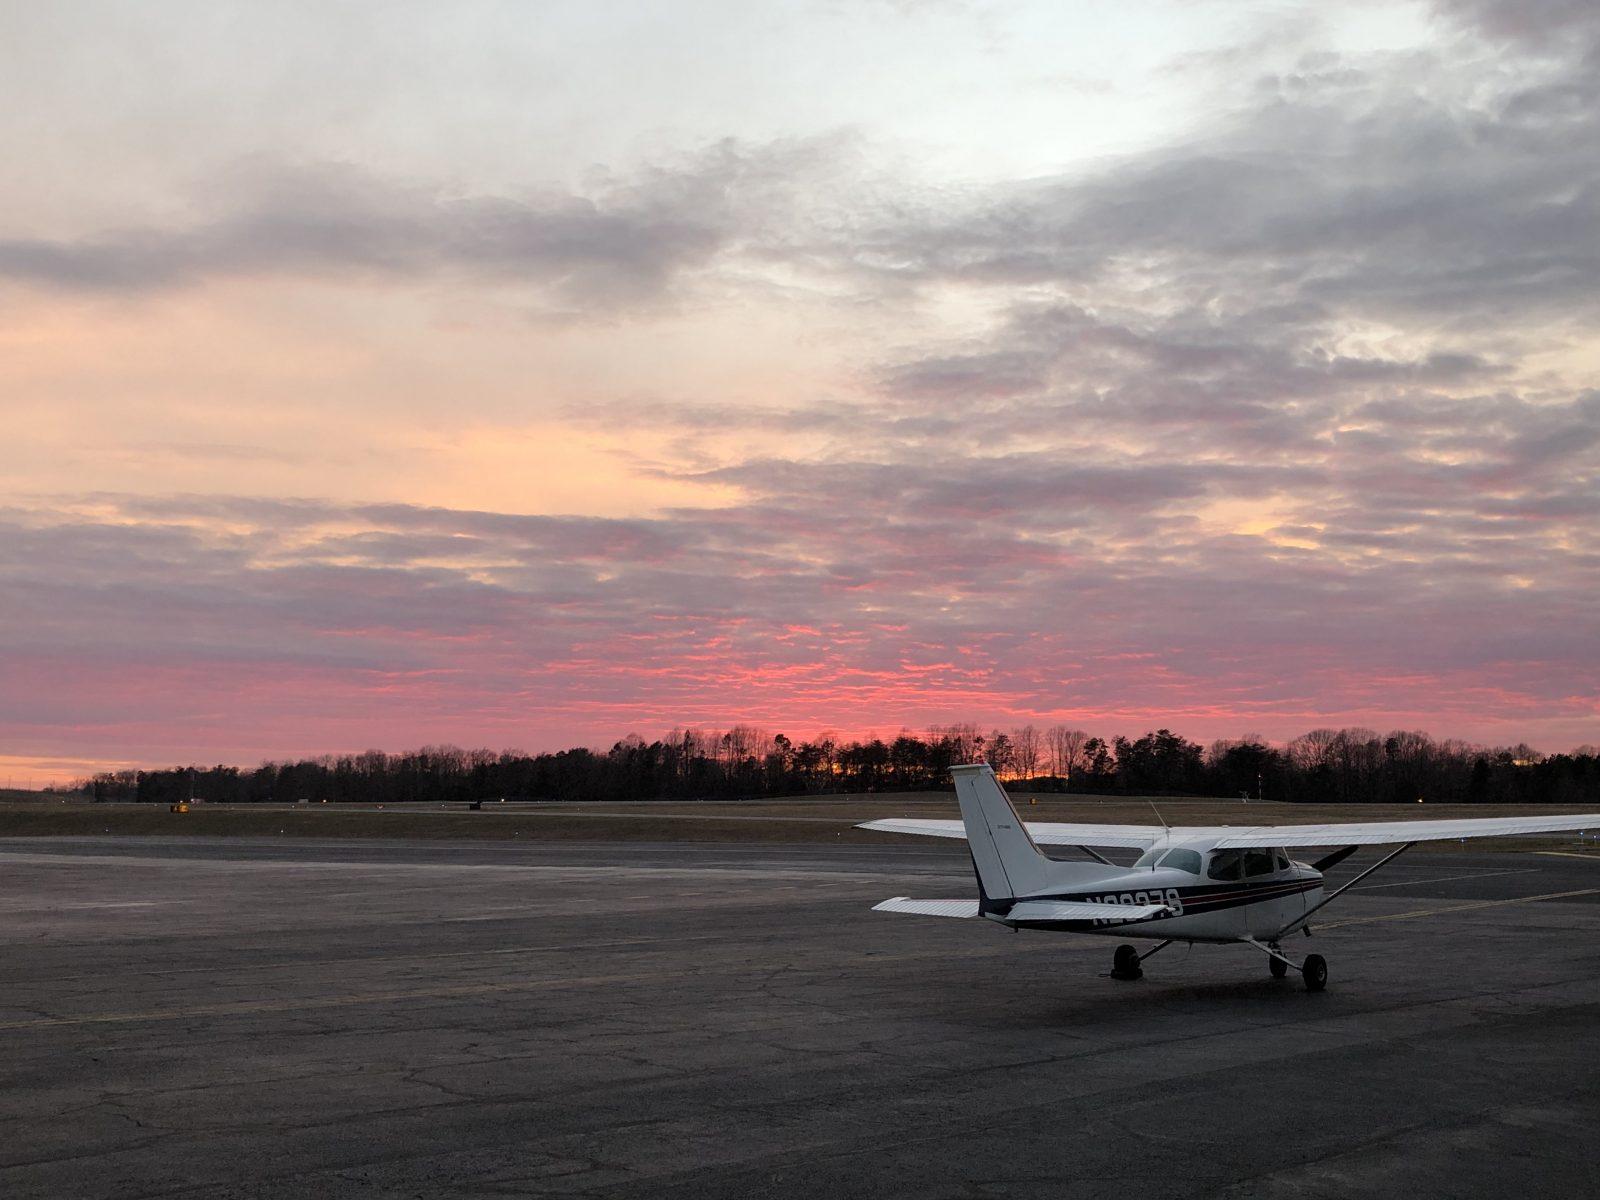 charlottesville to san diego flight